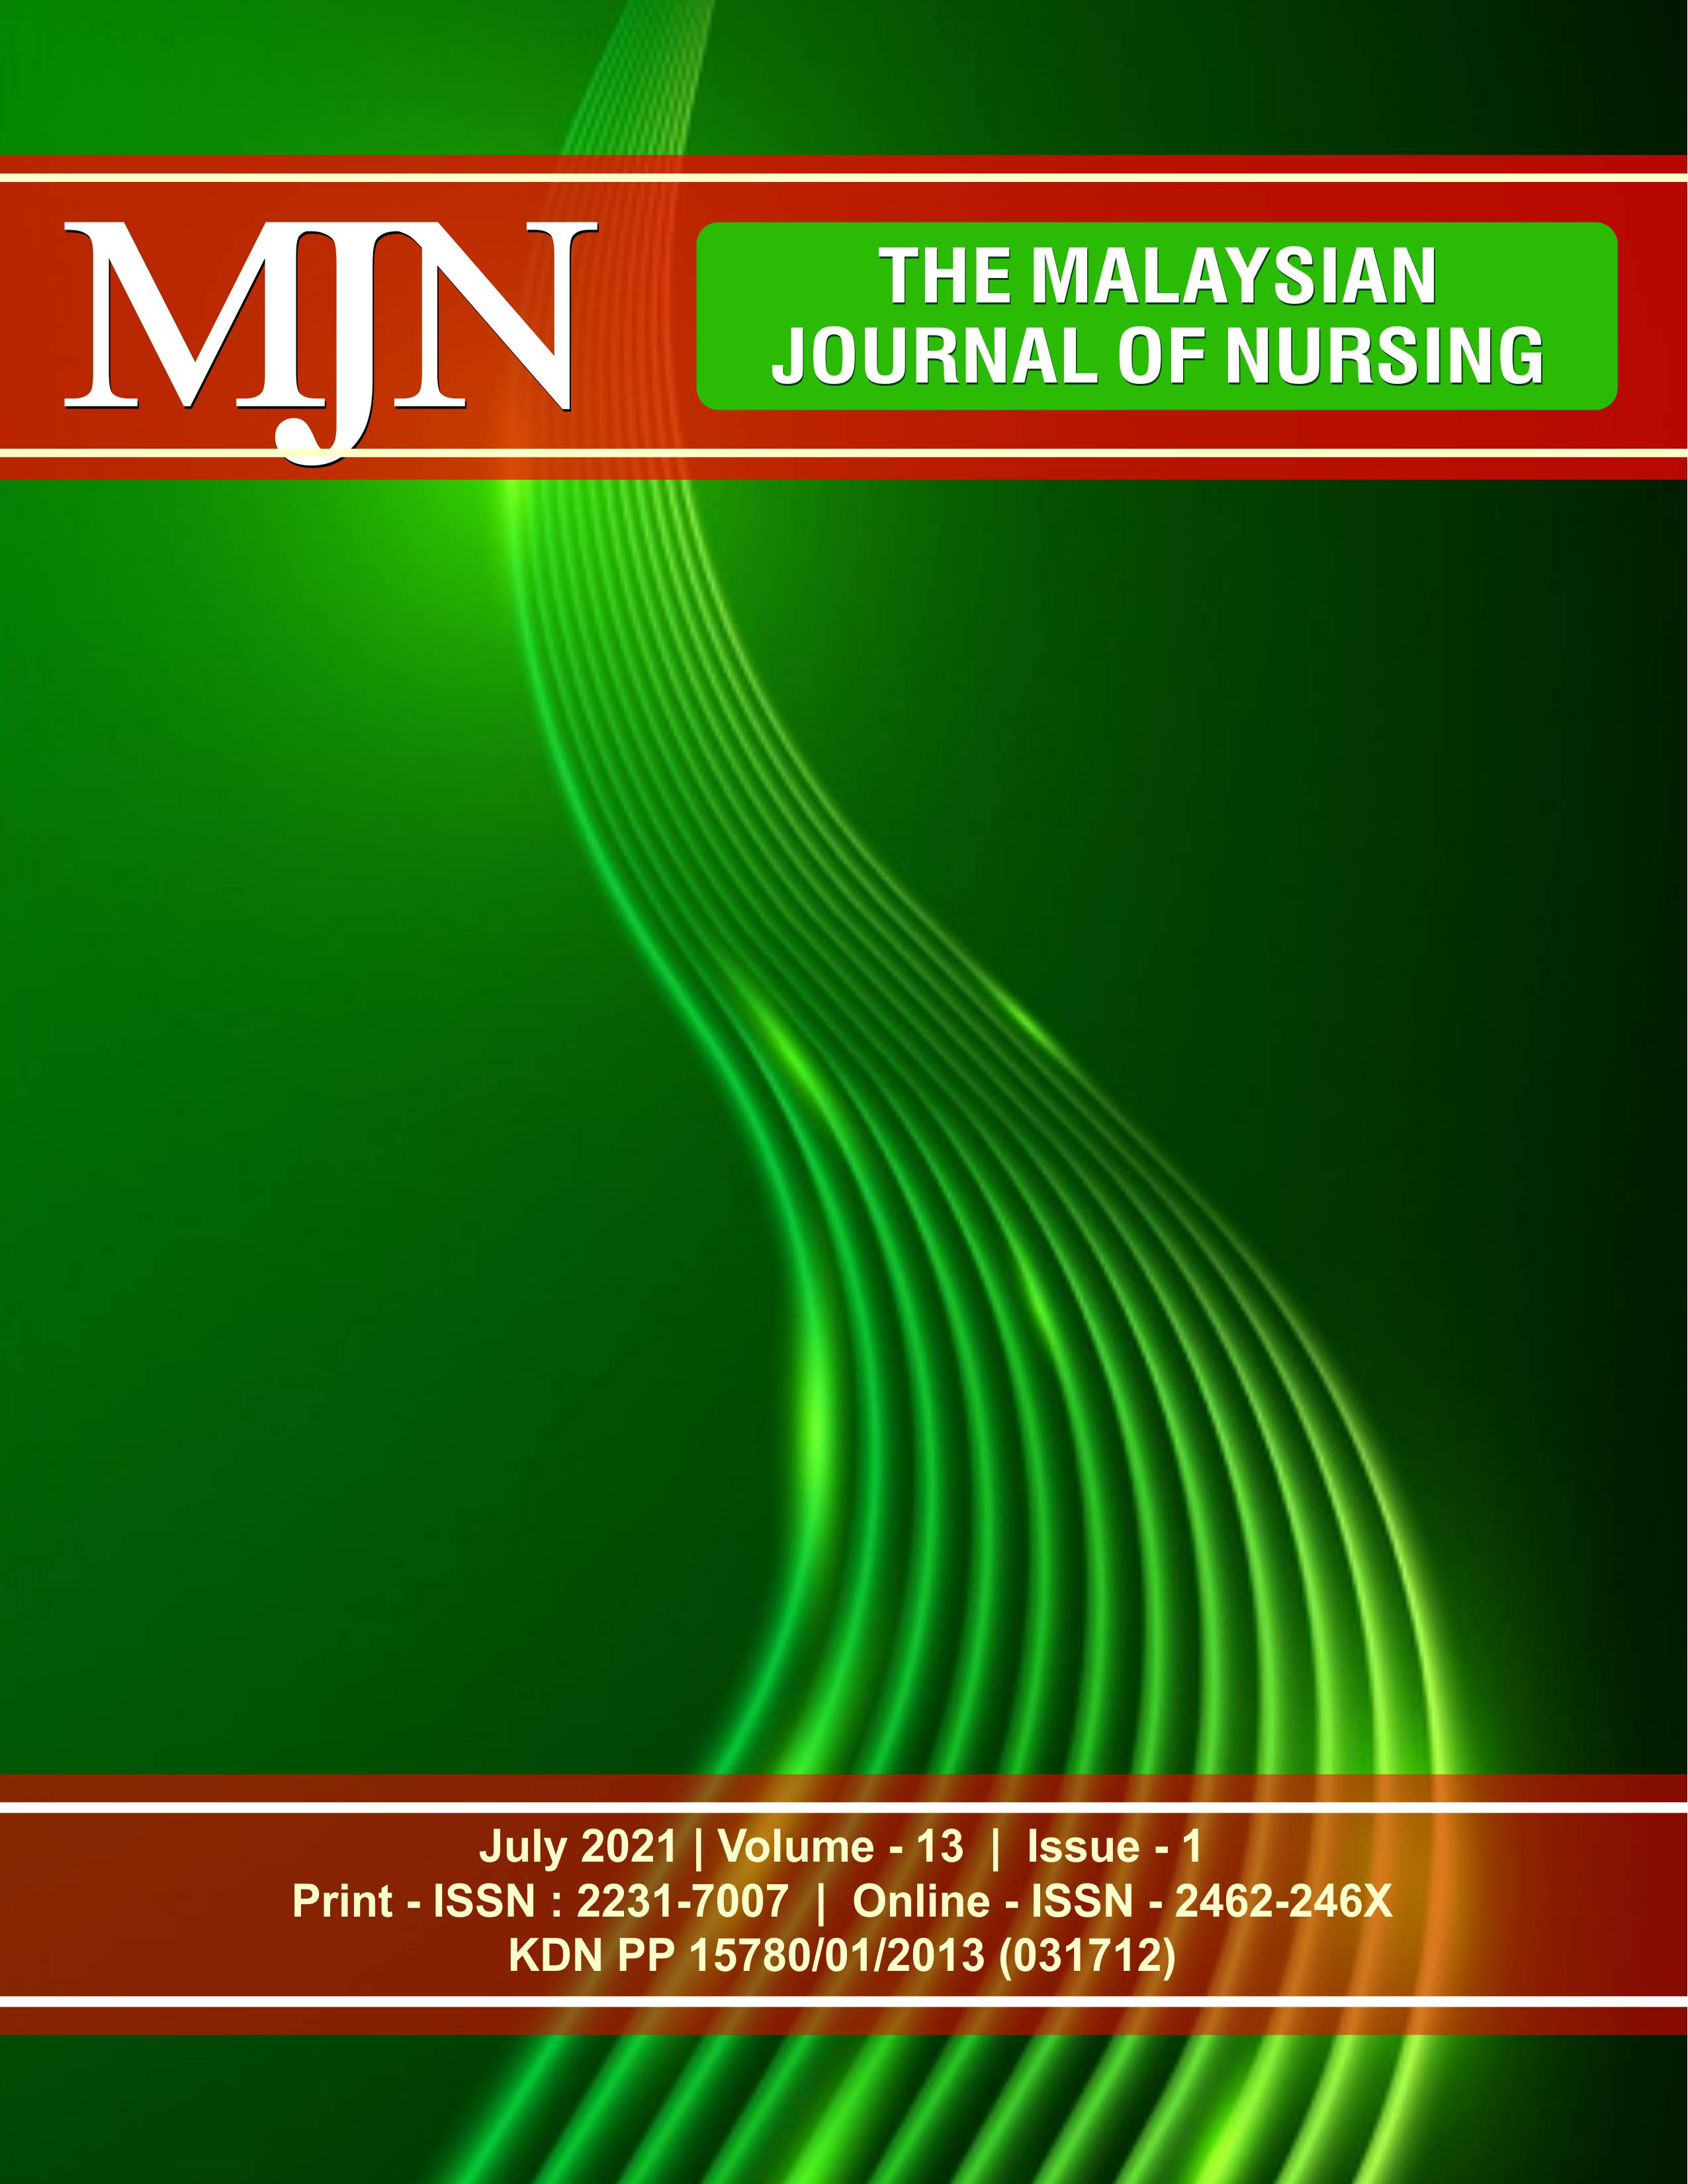 View Vol. 13 No. 1 (2021): The Malaysian Journal of Nursing